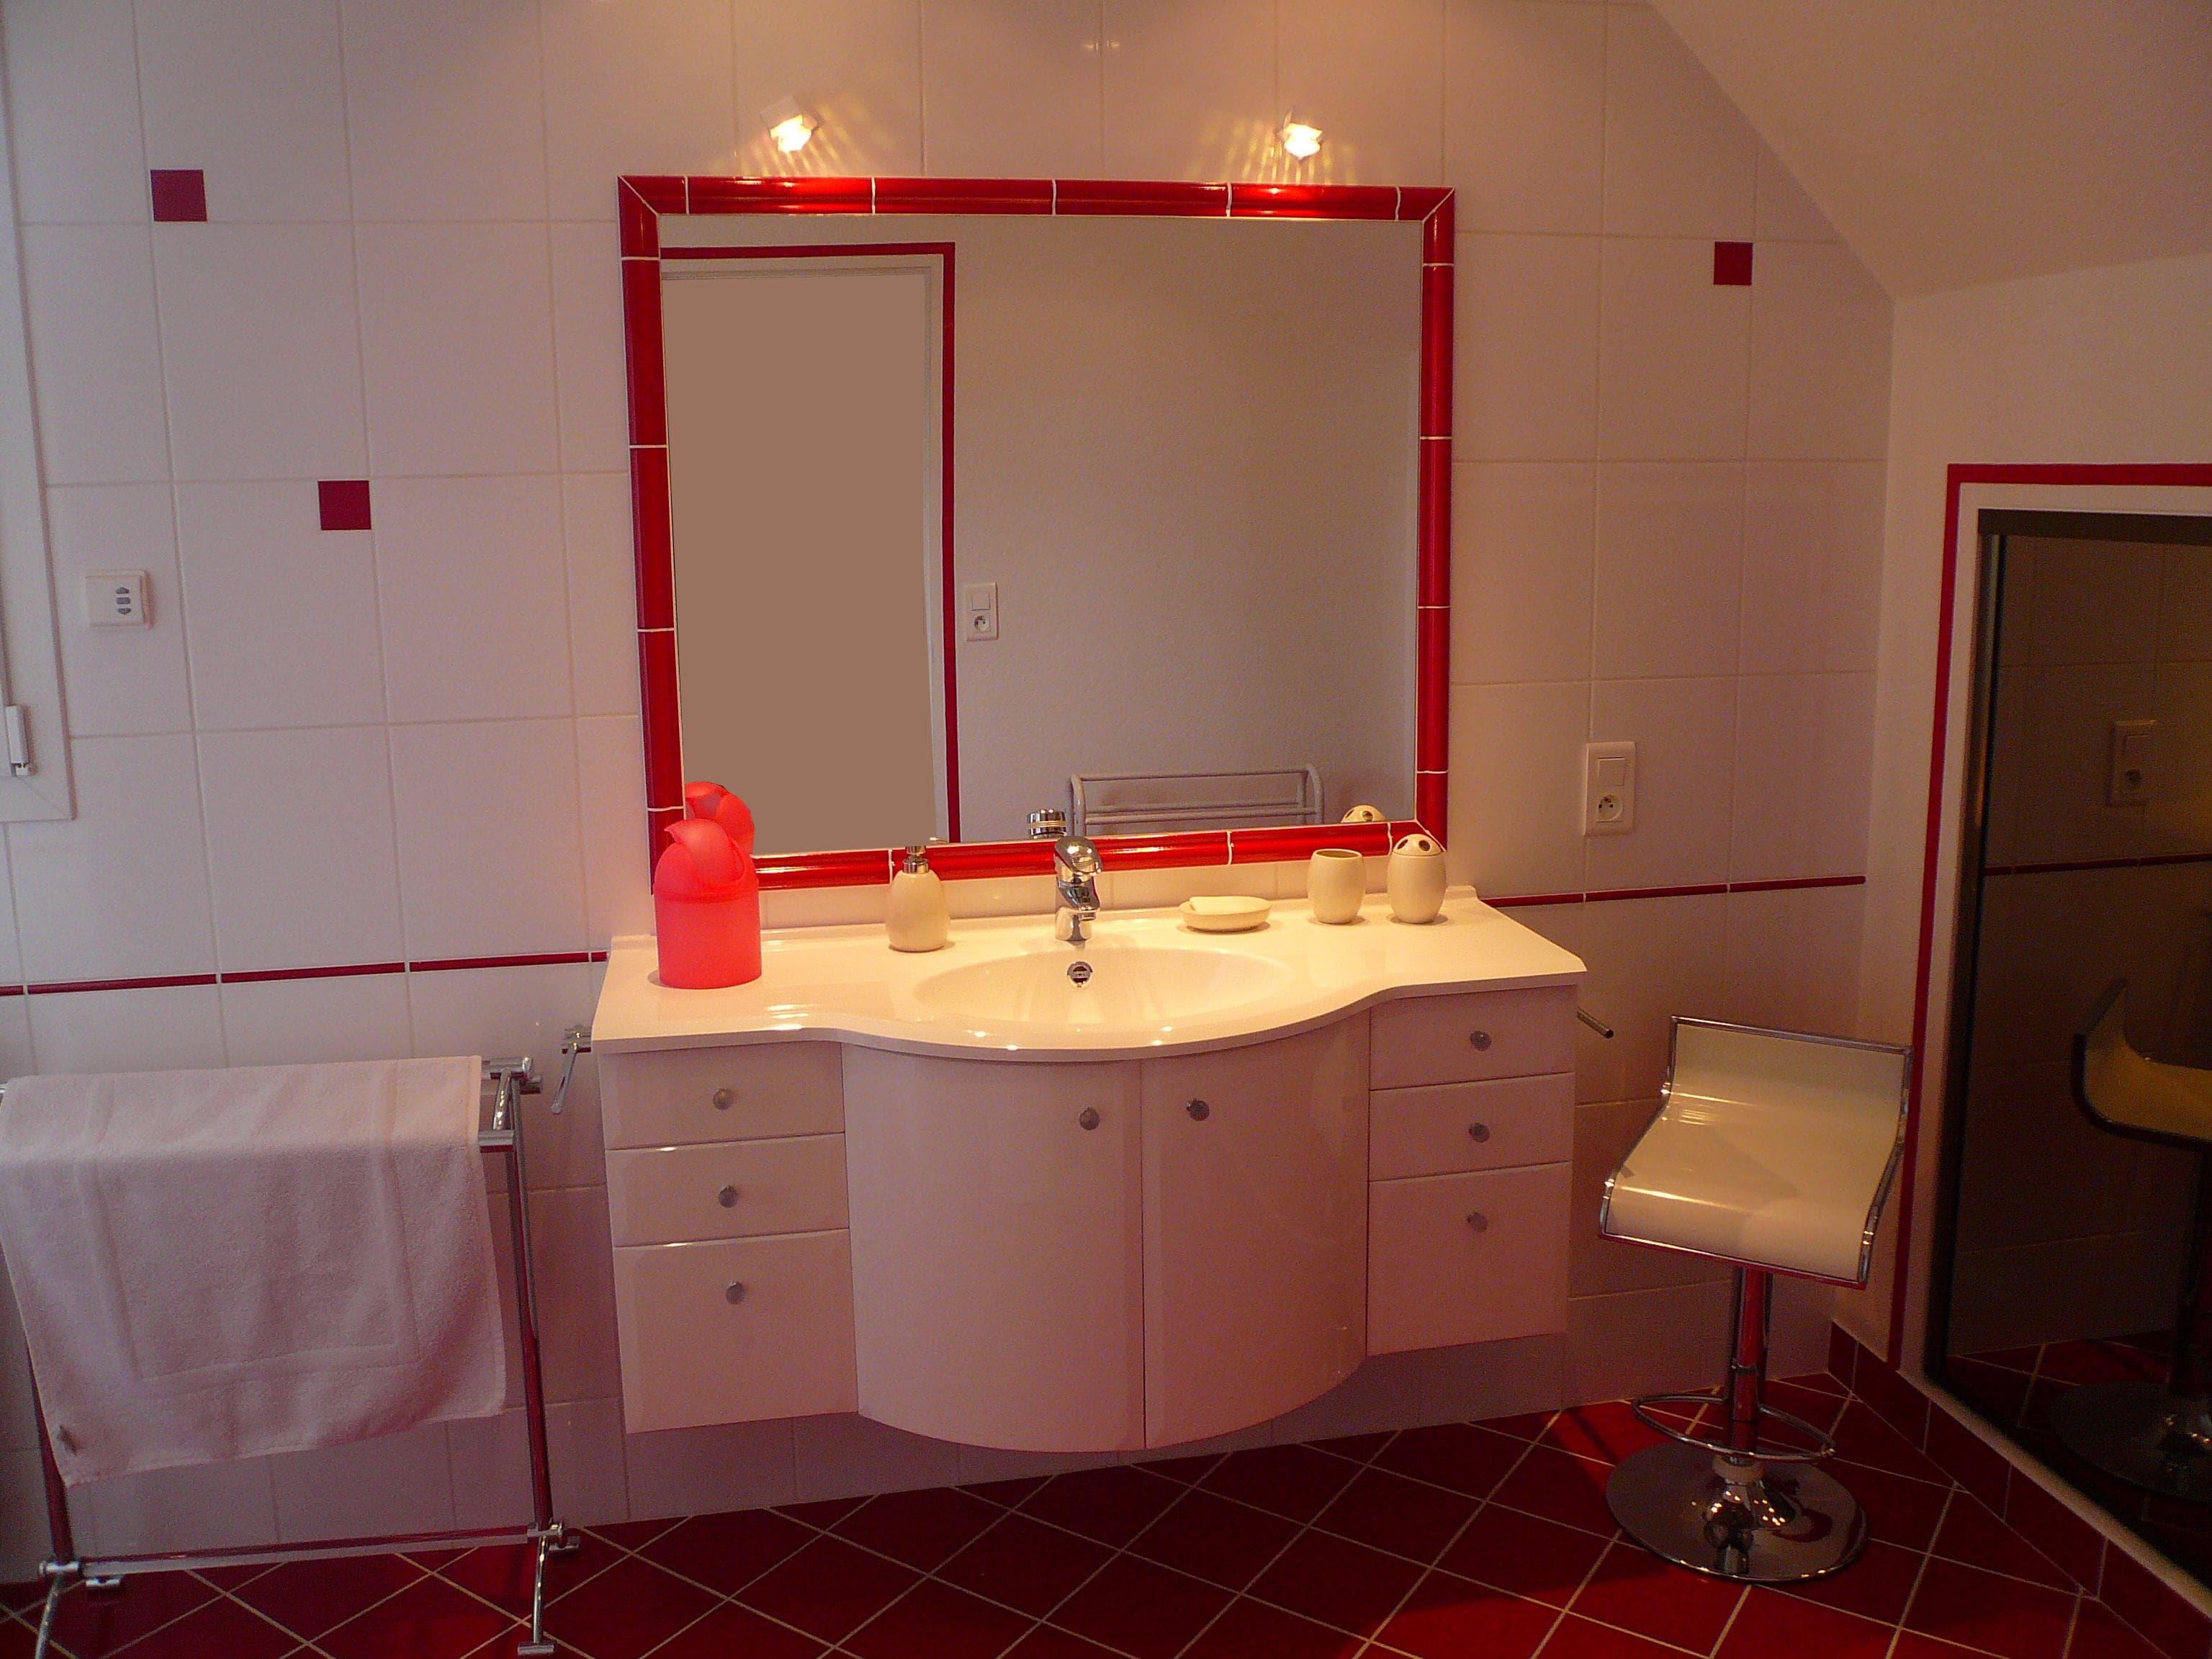 plomberie, salle de bain, sanitaire - Tuyauterie Salle De Bain